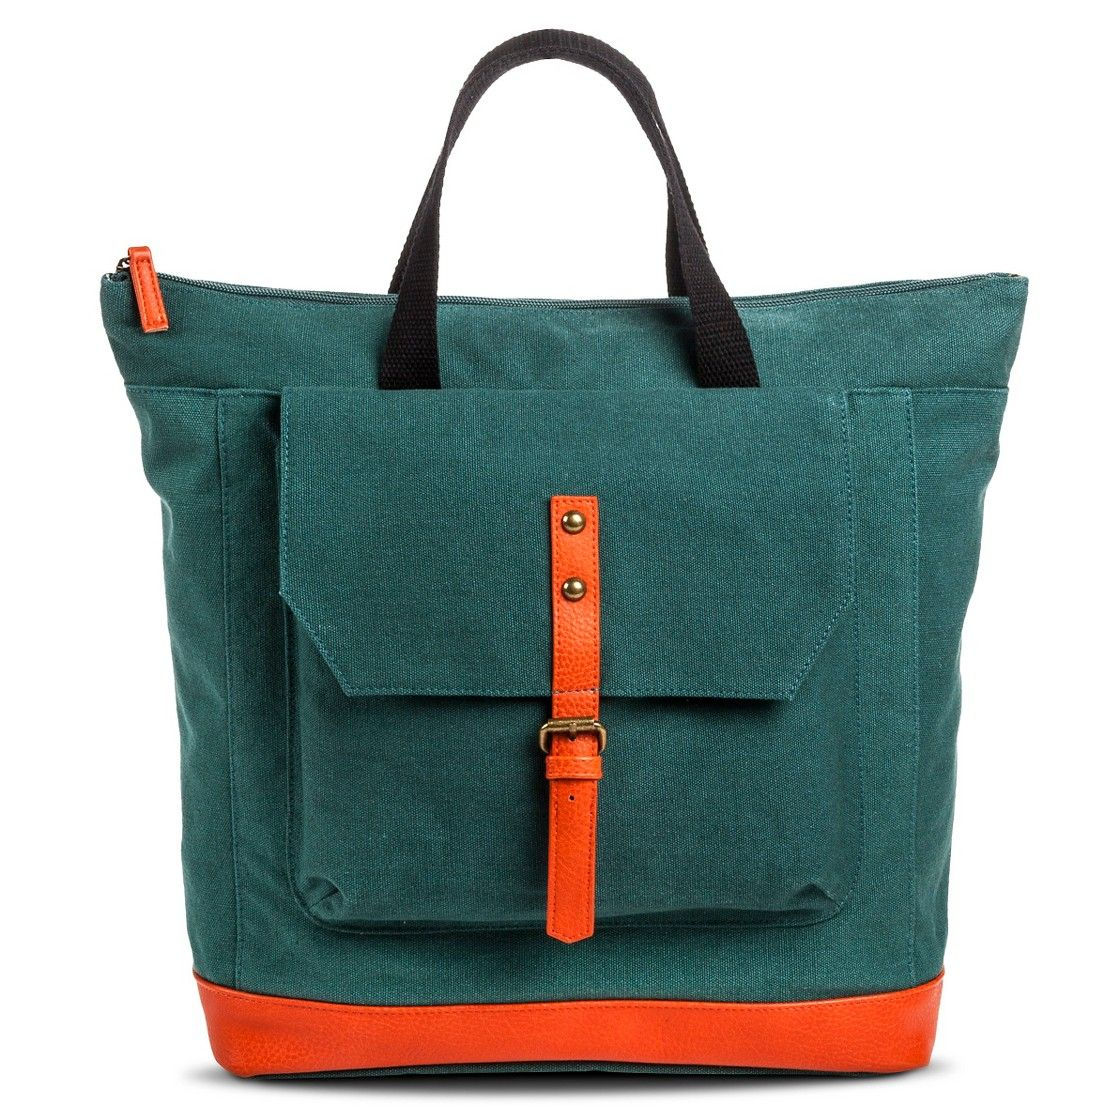 Women S Solid Canvas Backpack Handbag With Neonorange Detail Green Dance Bagsbackpack